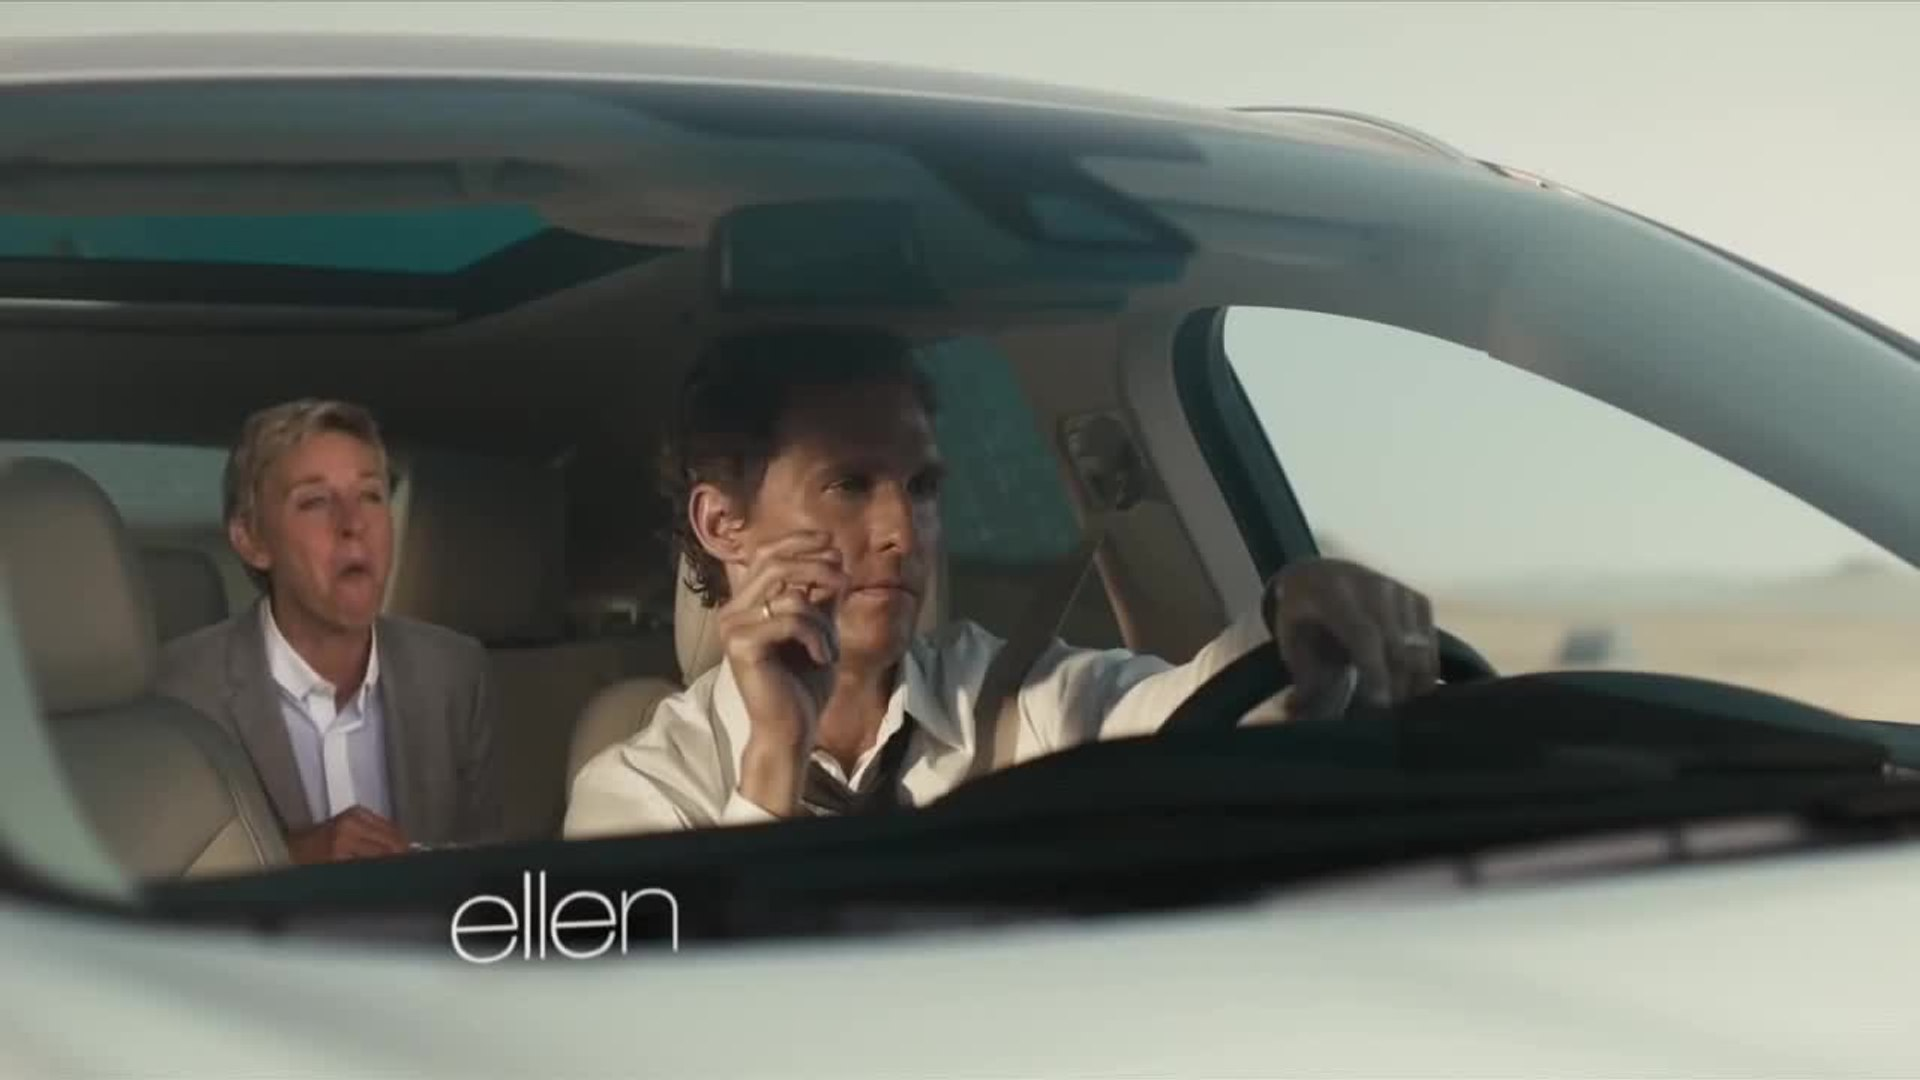 Ellen Parodies Matthew McConaughey's Lincoln Commercial